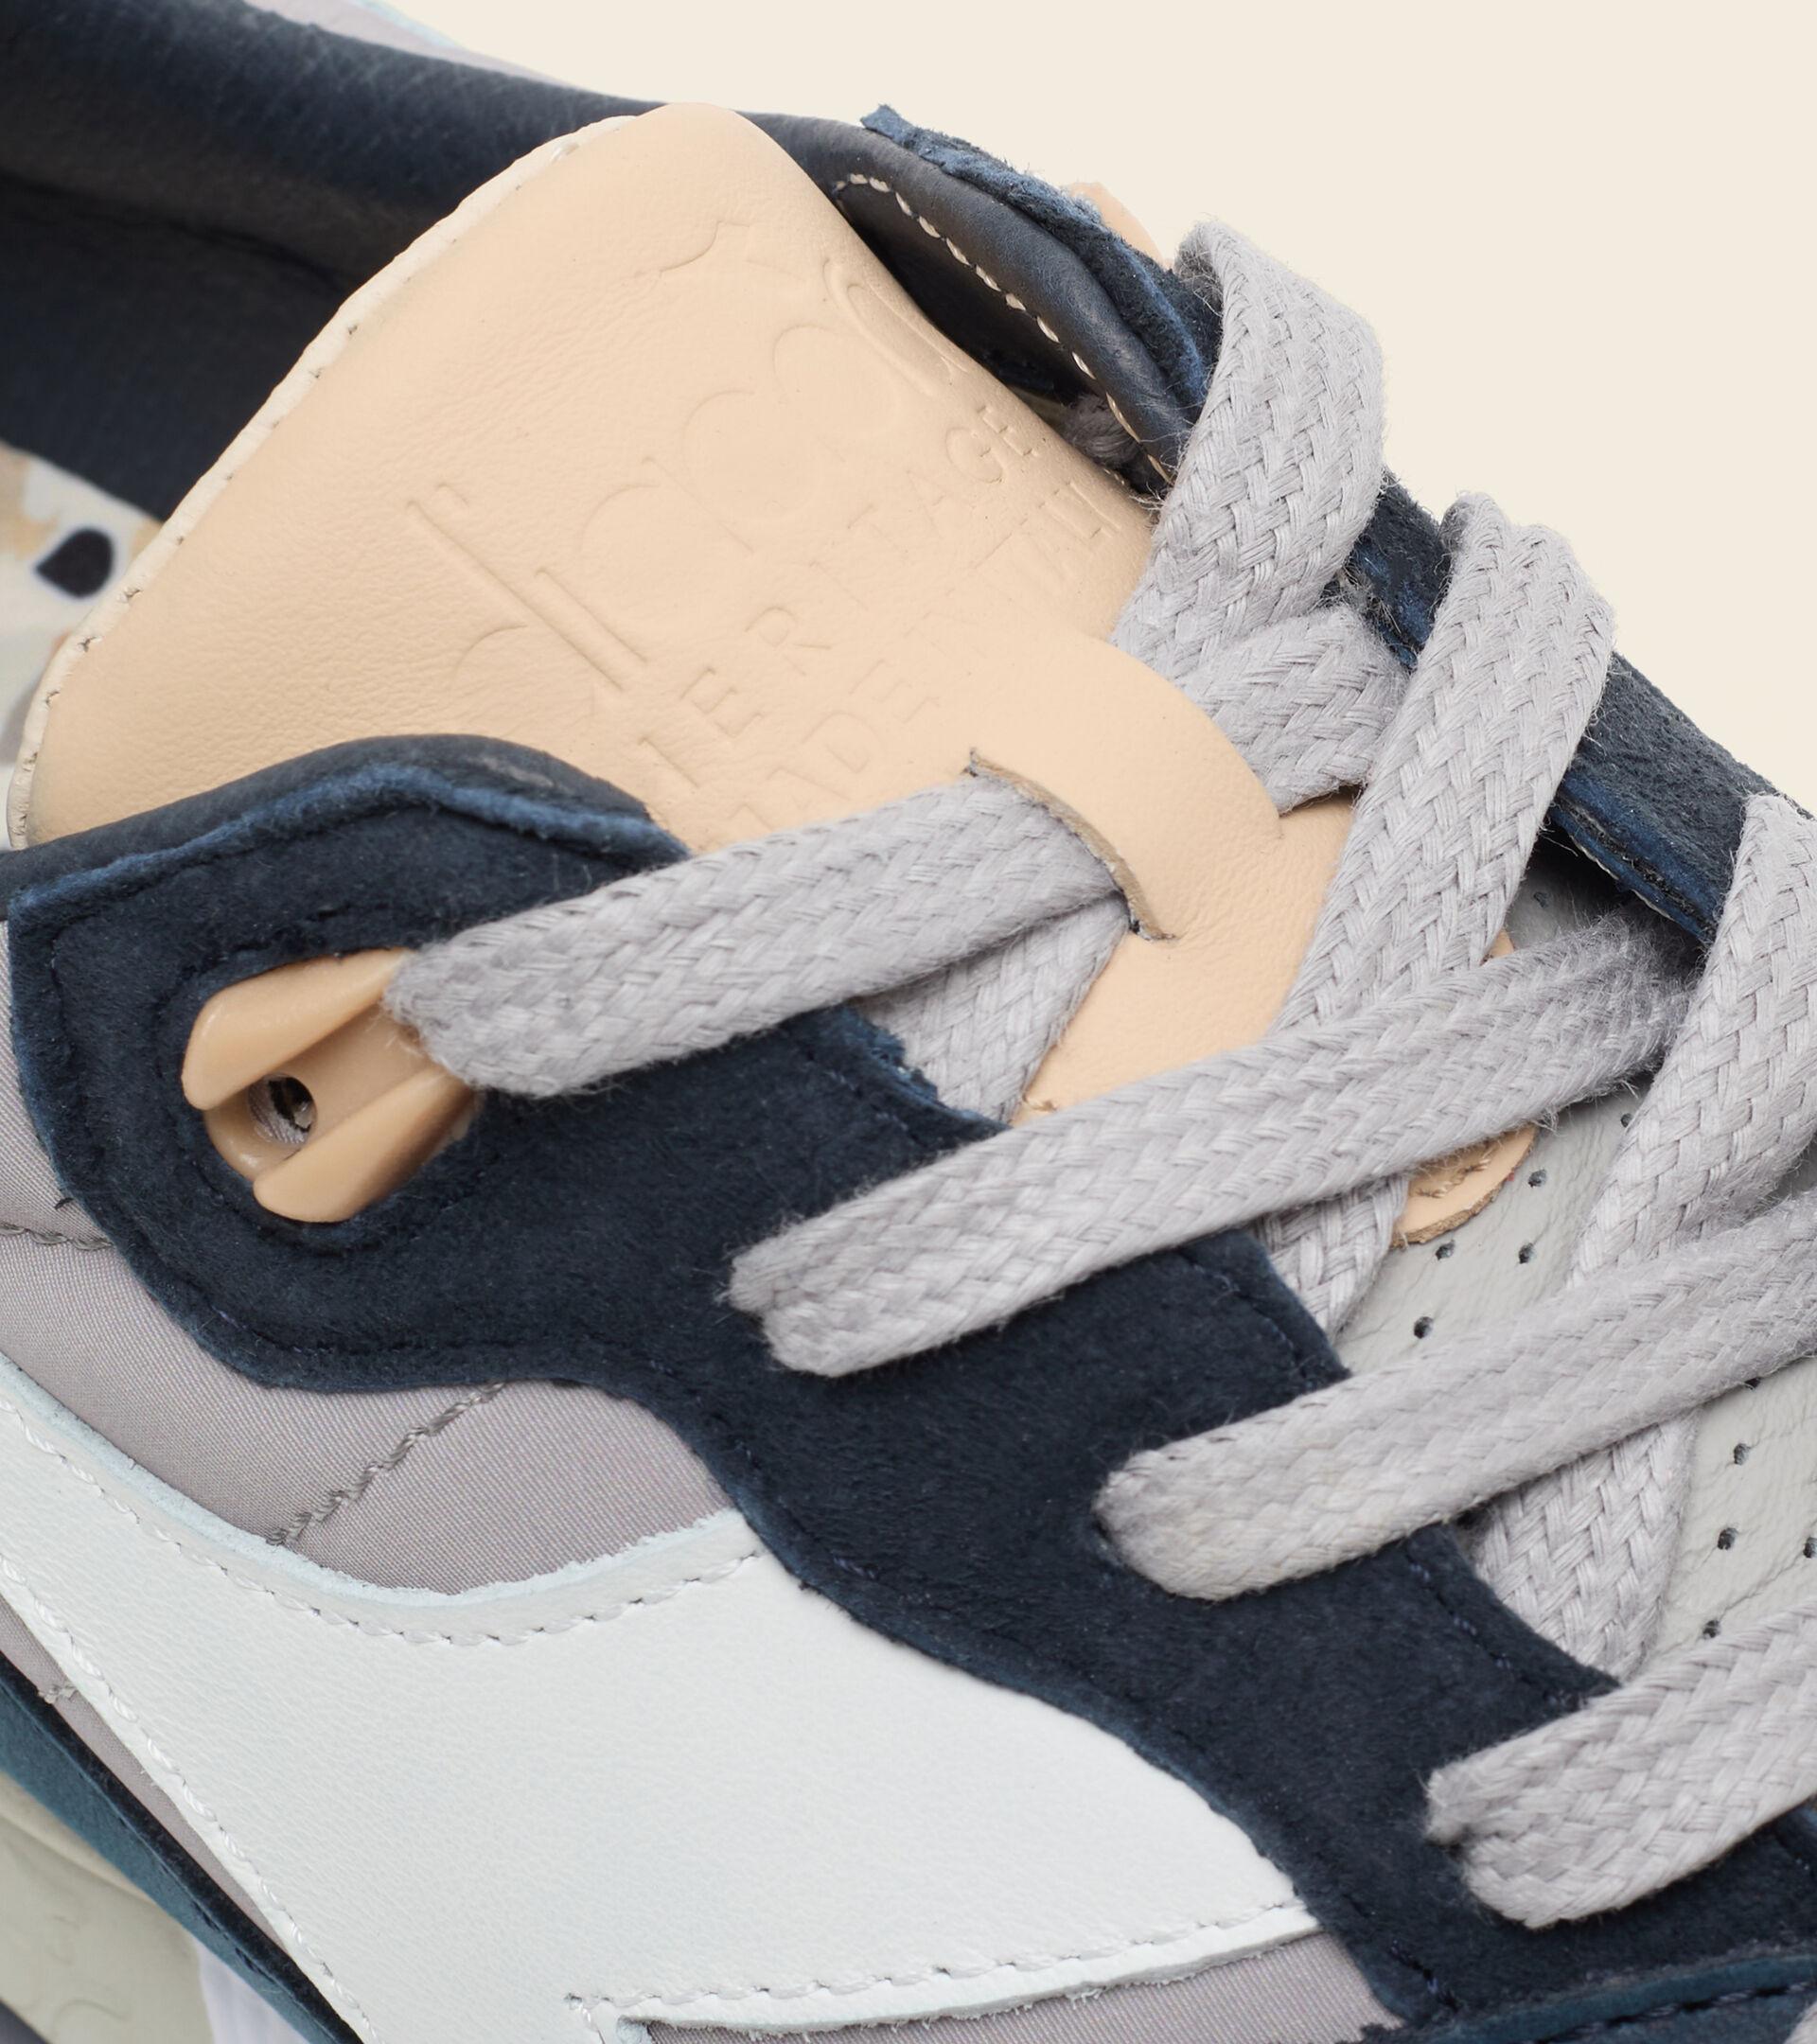 Made in Italy Heritage Shoe - Men N9000 ITALIA PALOMA GREY - Diadora